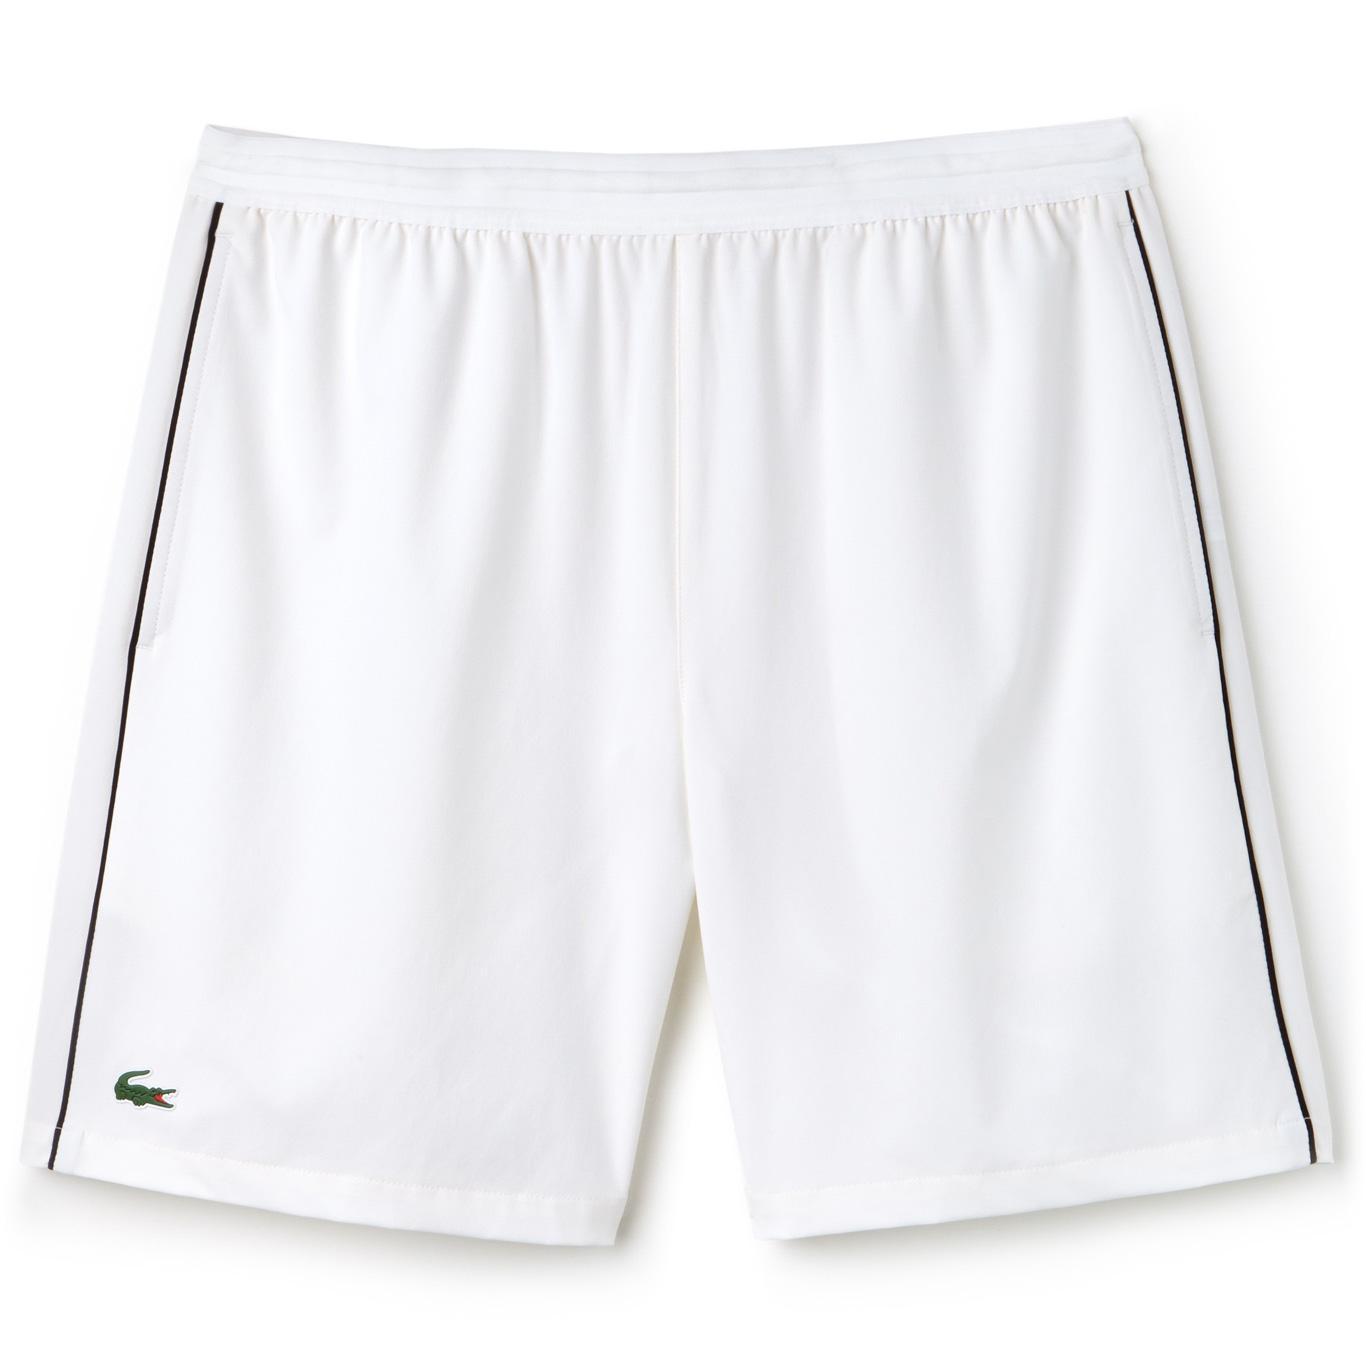 f1fe8e55 Lacoste Mens Djokovic Stretch Woven Shorts - White